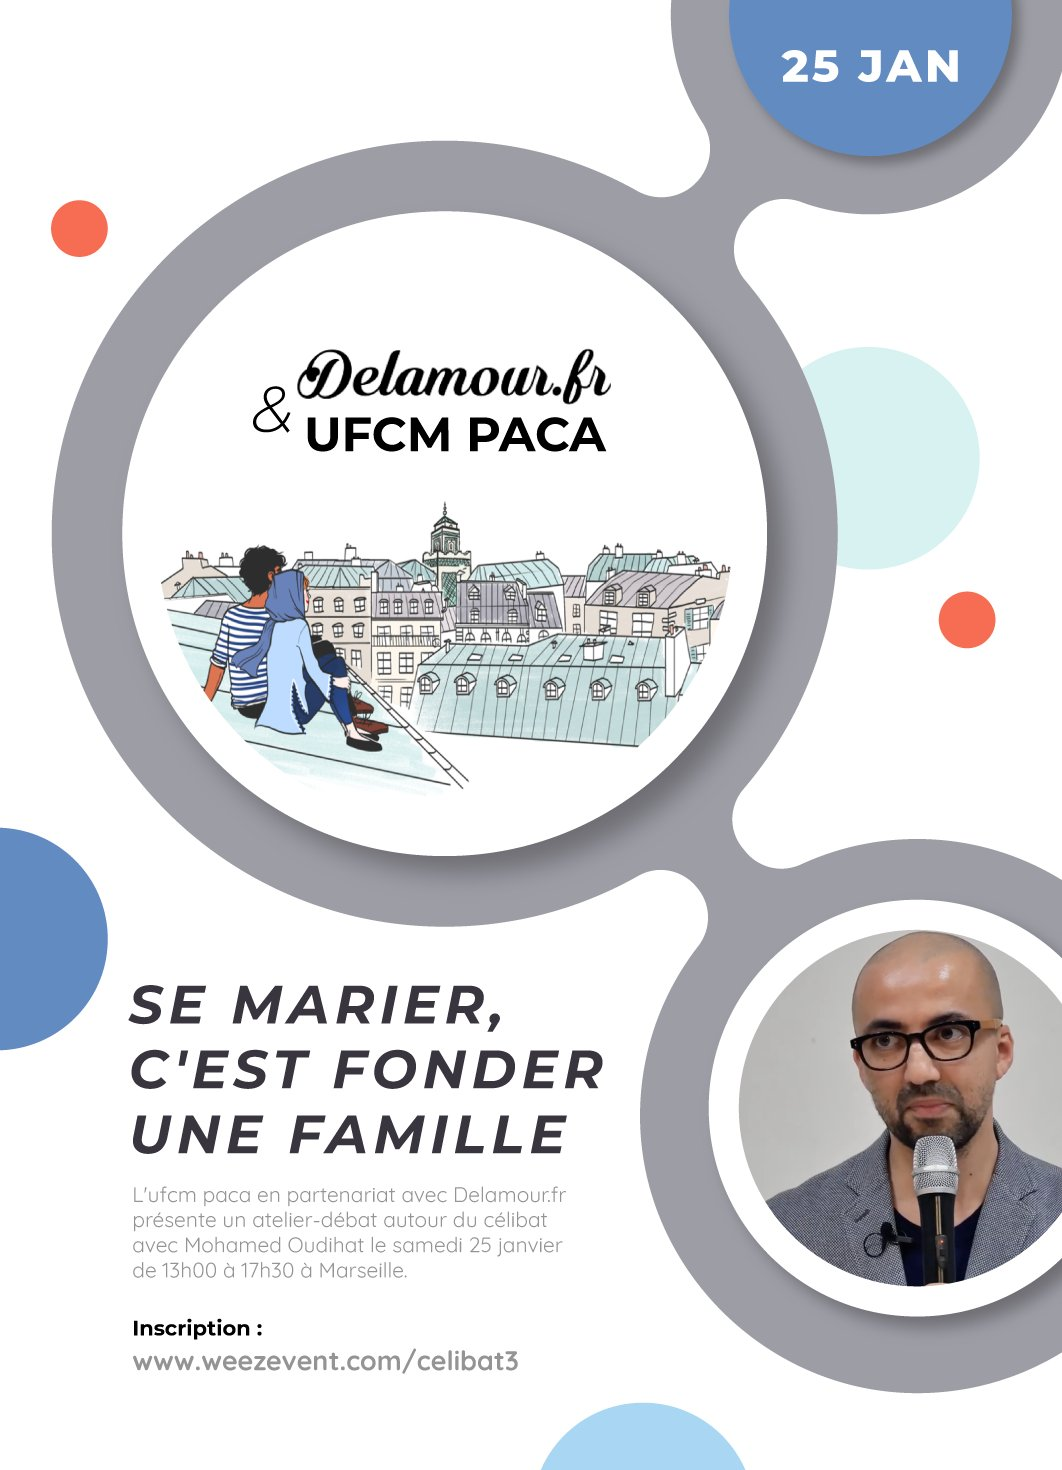 https://www.saphirnews.com/agenda/Se-marier-c-est-fonder-une-famille_ae688638.html